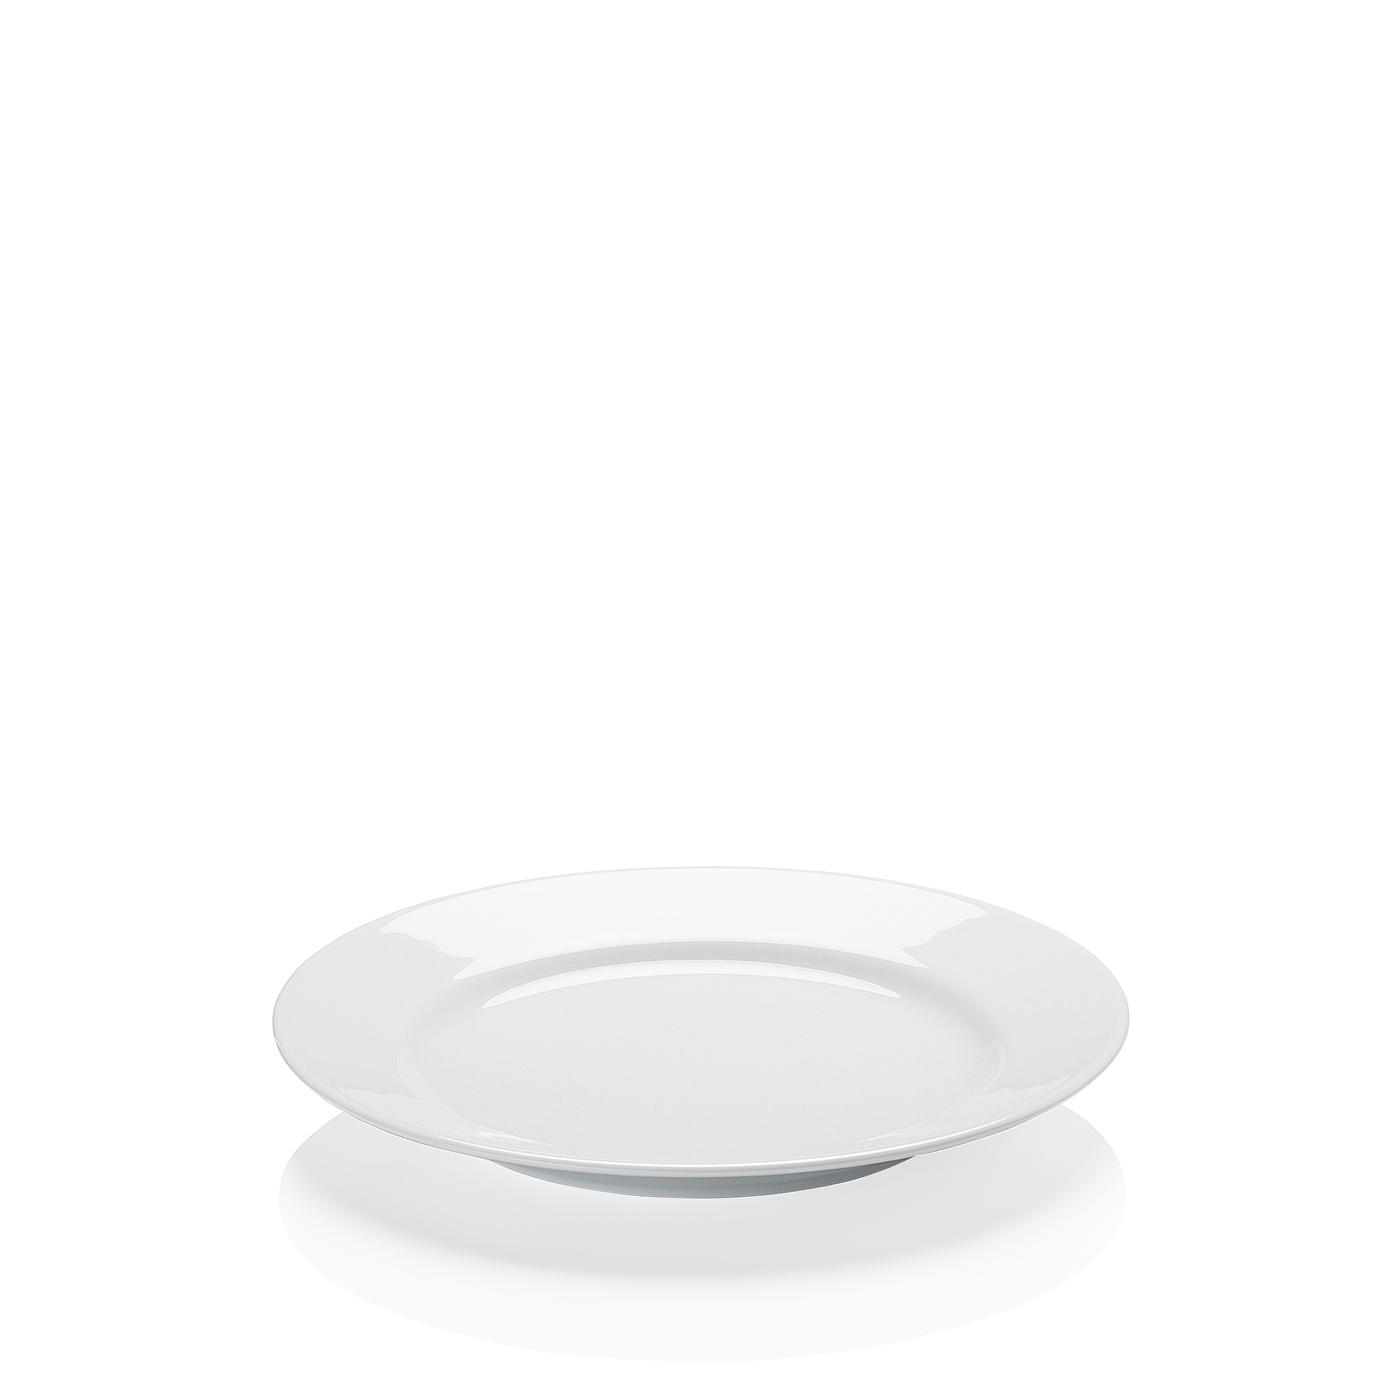 Teller flach 23 cm Cucina Bianca Arzberg